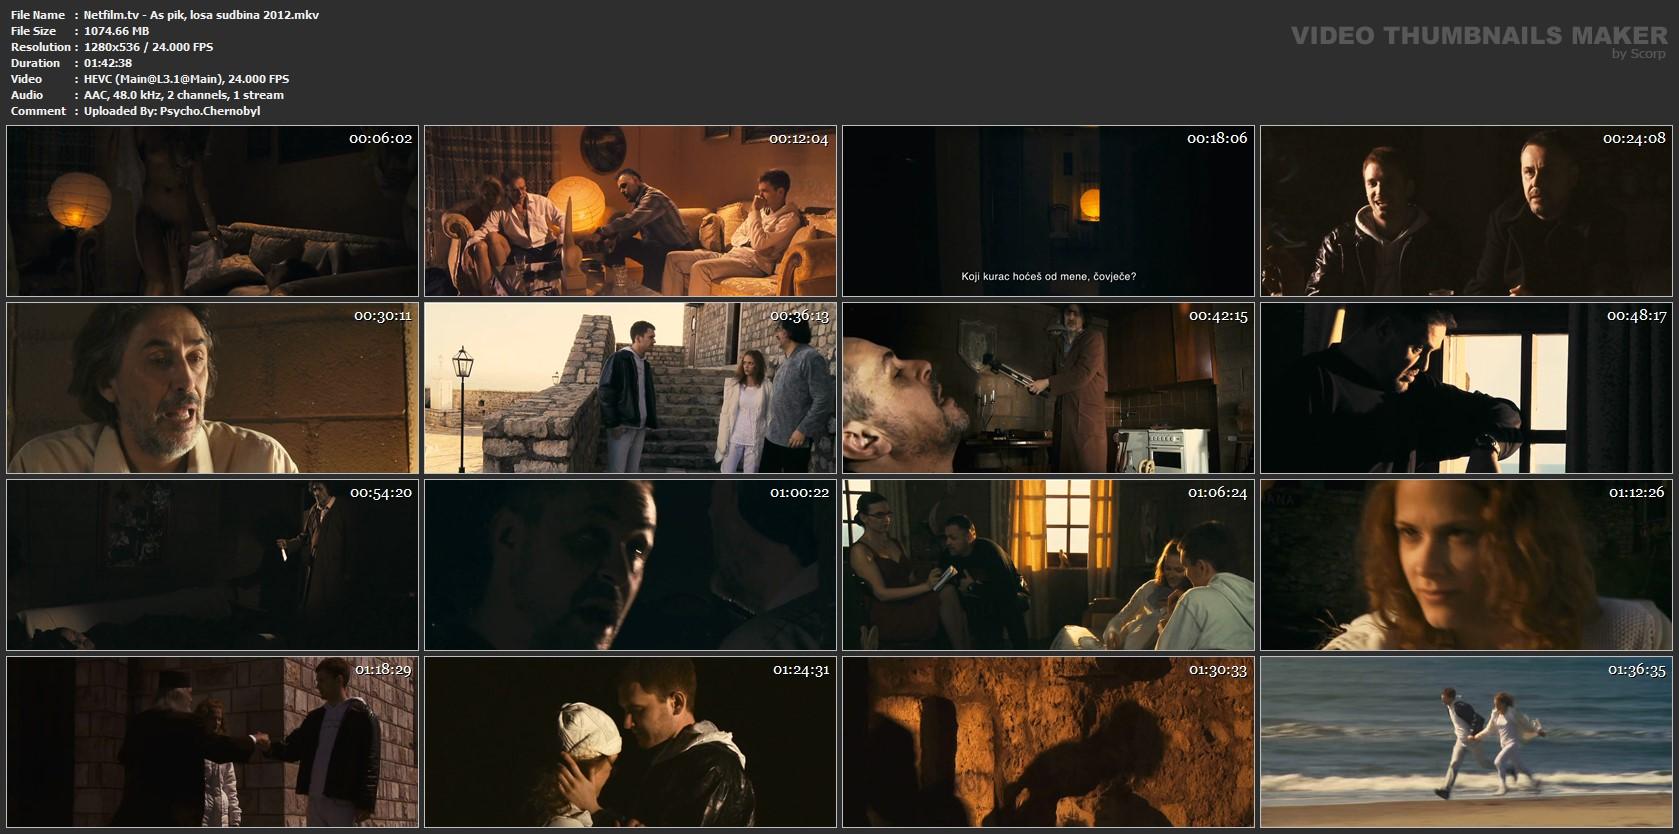 Netfilm-tv-As-pik-losa-sudbina-2012-mkv.